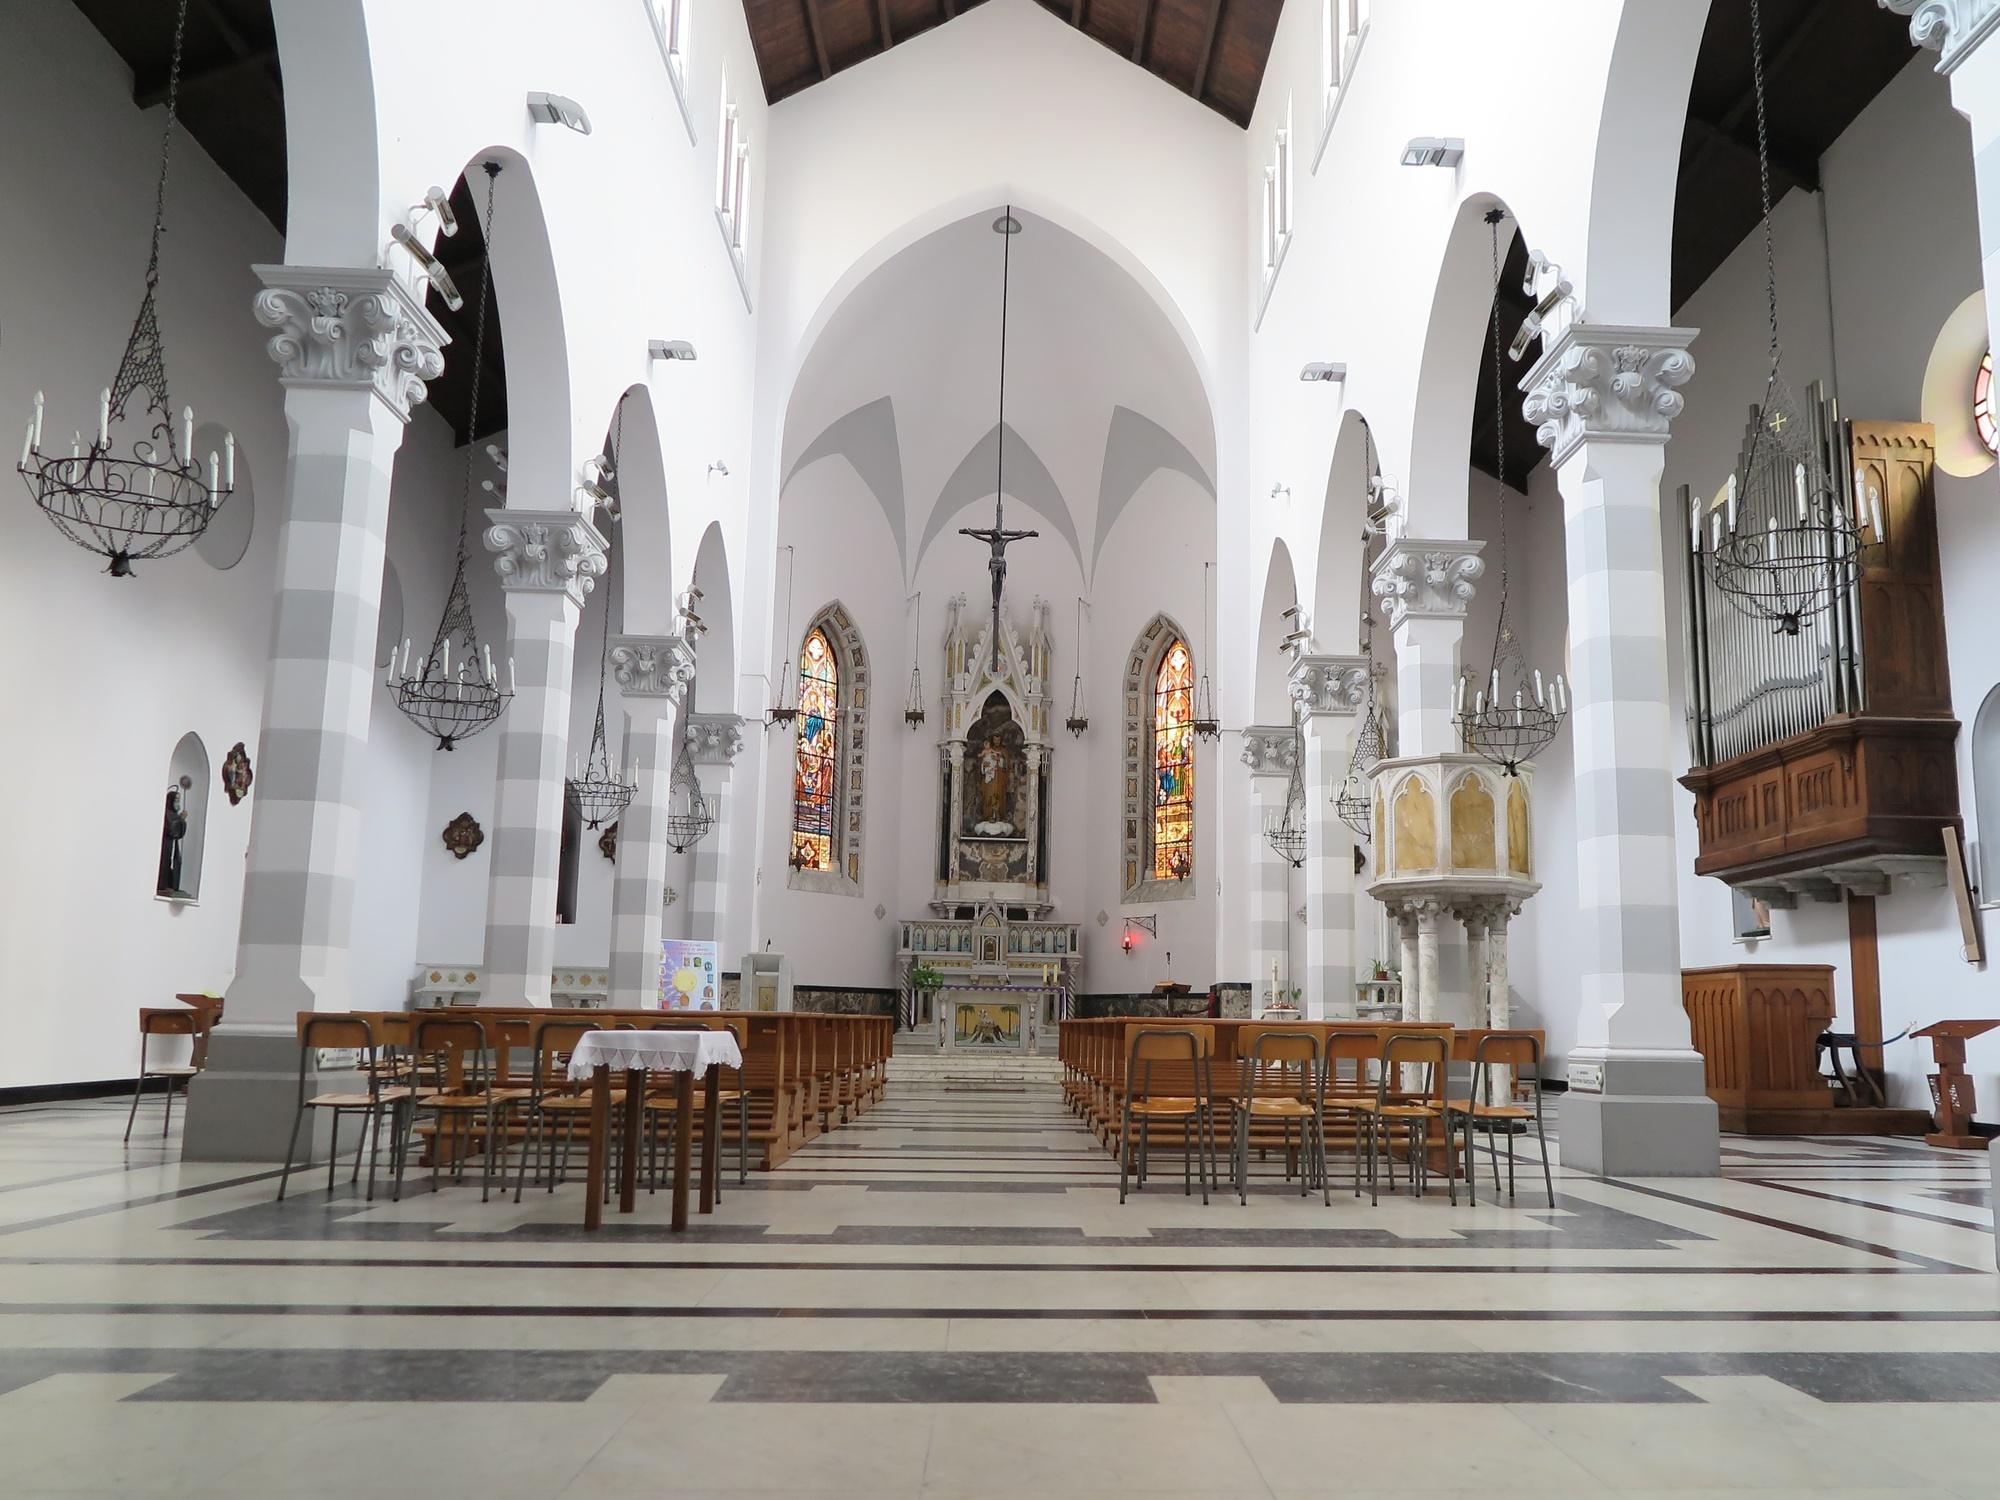 chiesa-2016-03-11-08-02-07